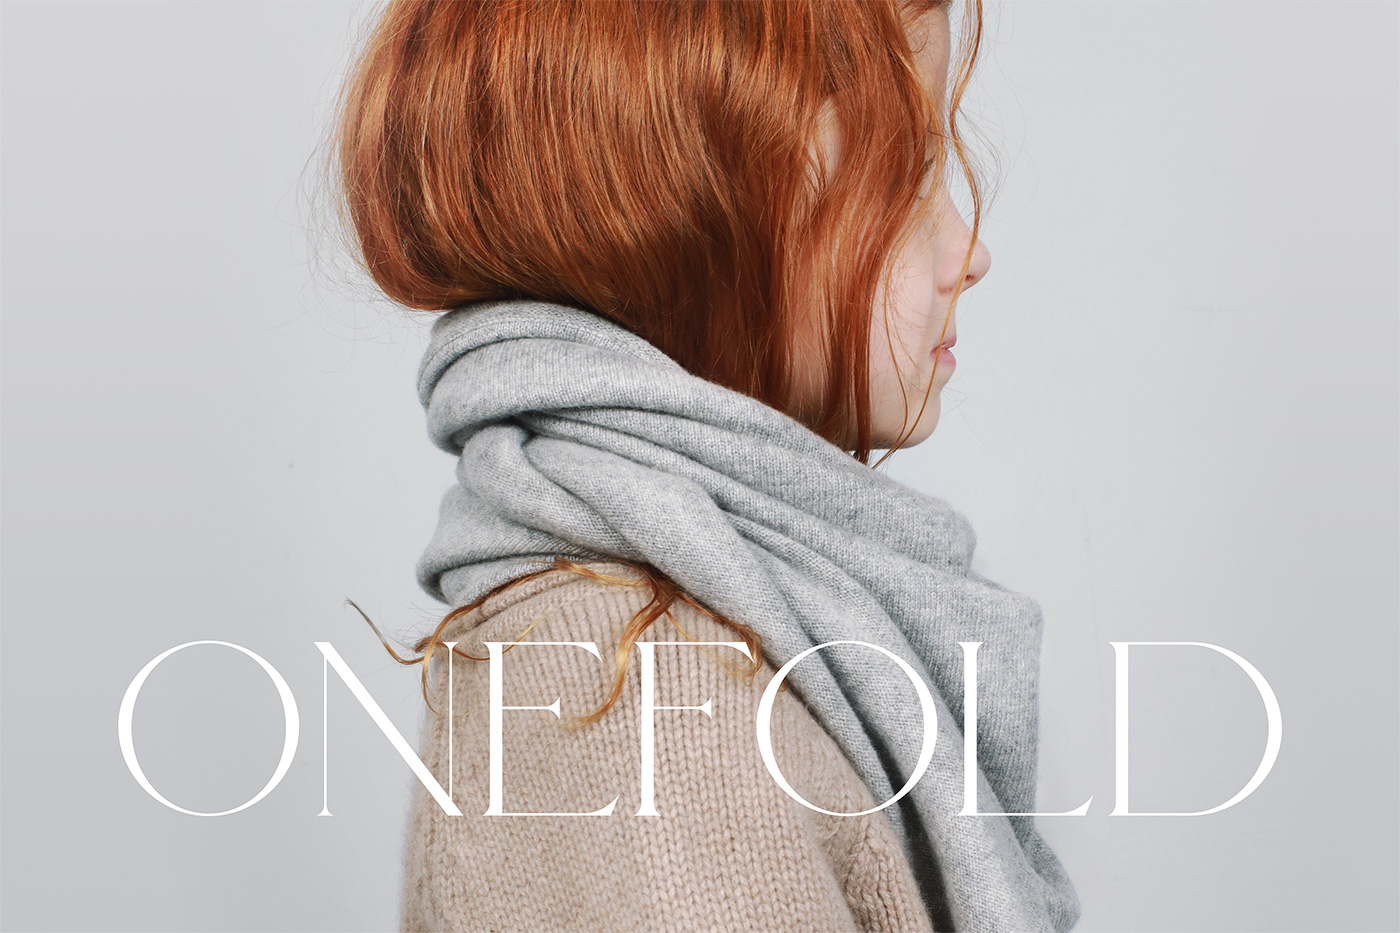 Onefold identity